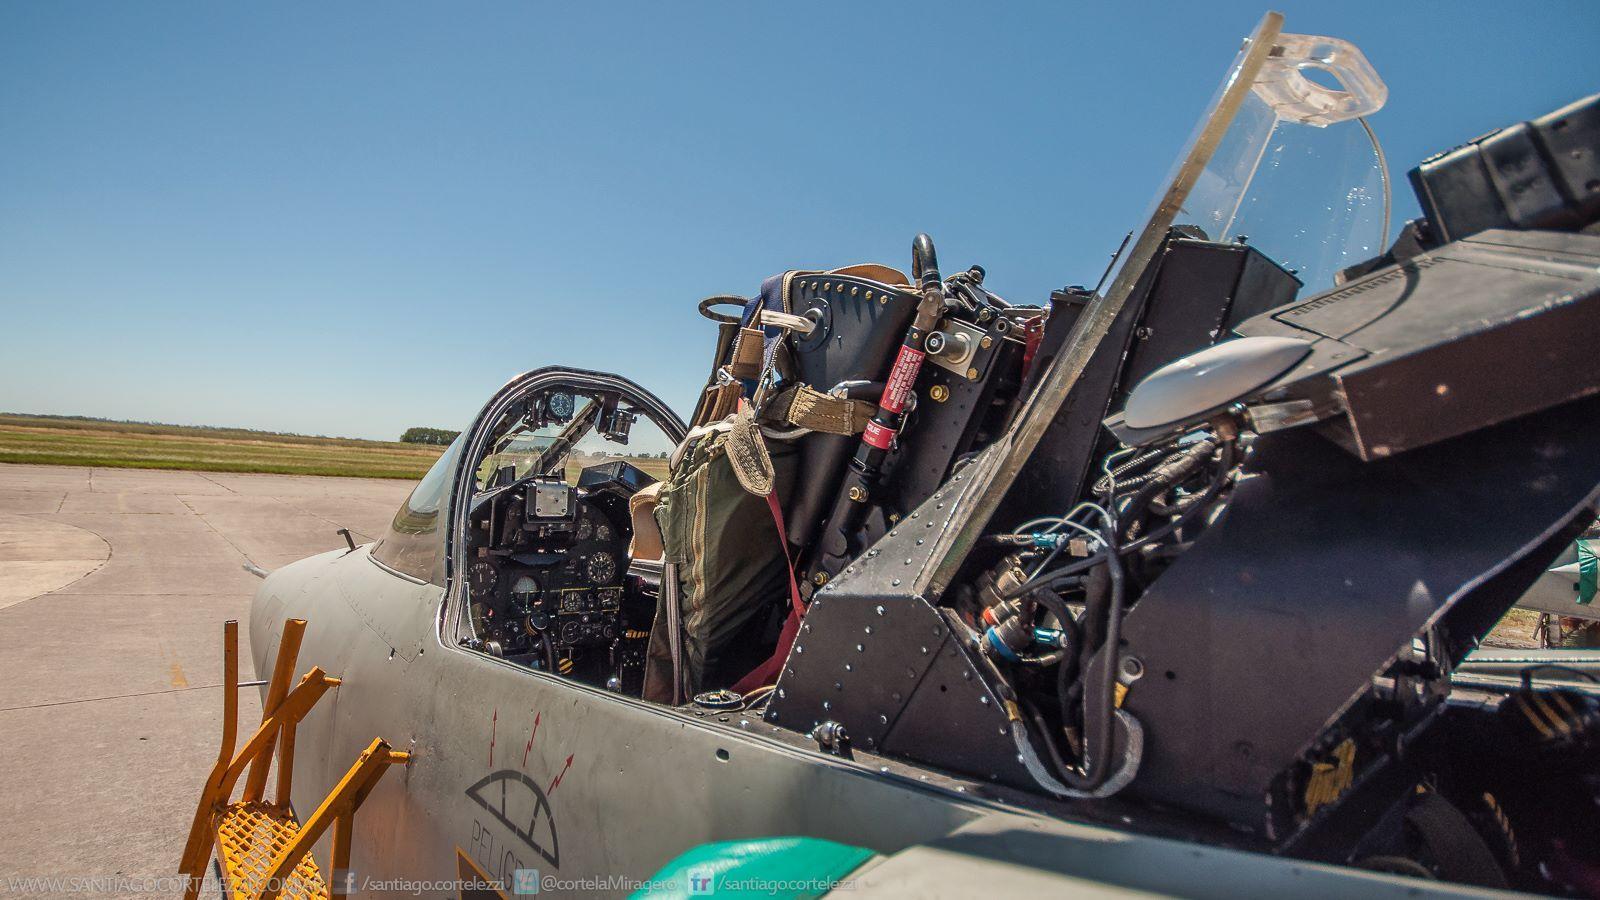 Fotos de la Fuerza Aérea Argentina - Página 3 Os8k6h